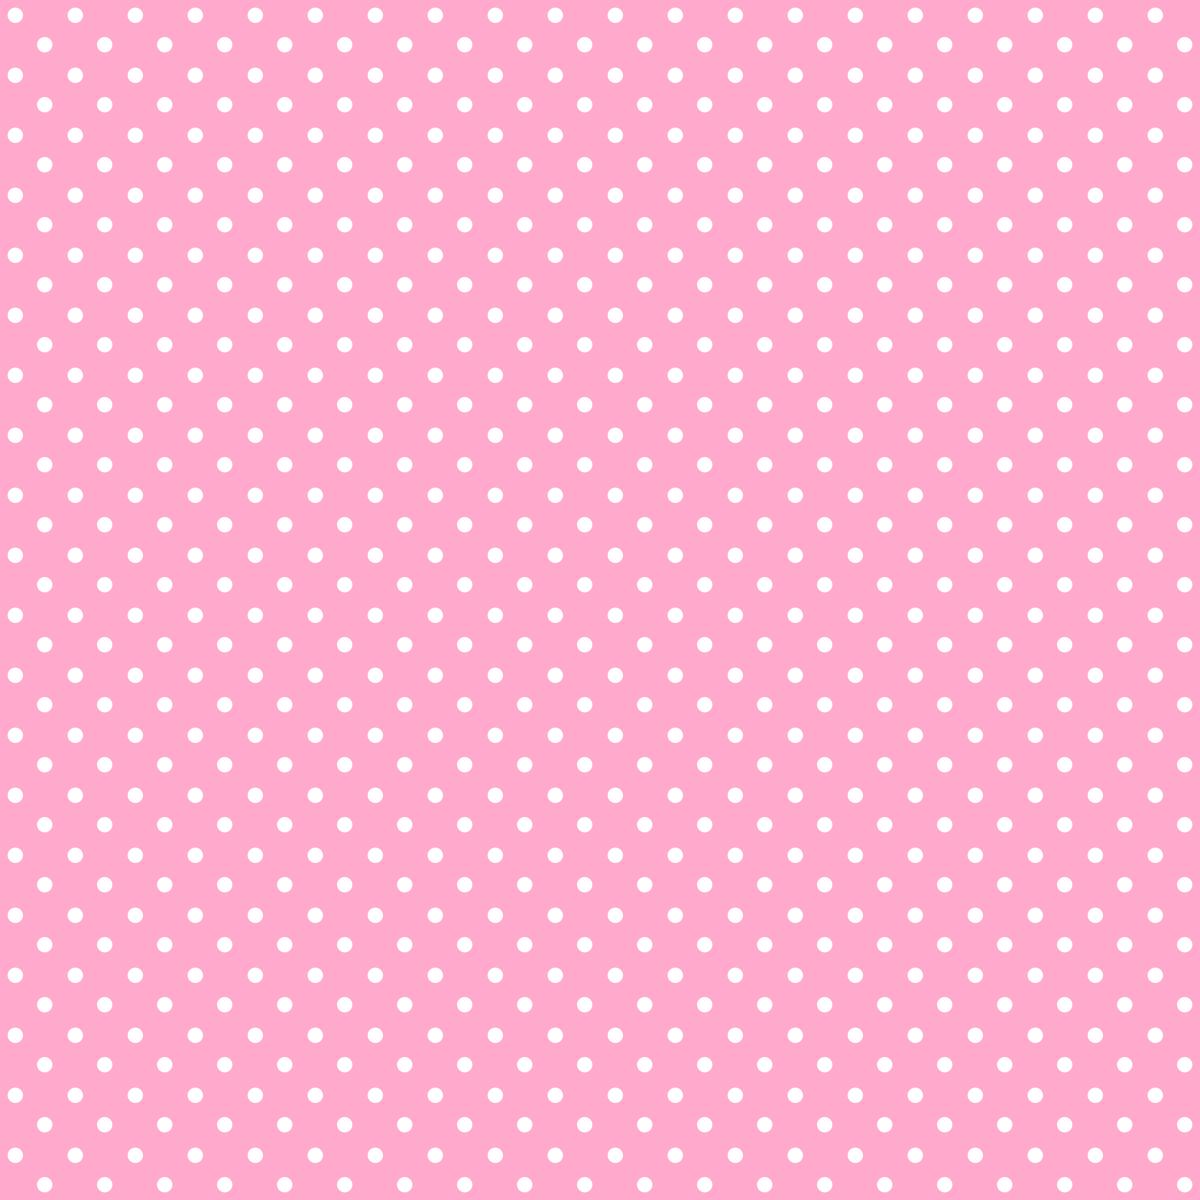 Pink Polka Dot Paper Png 1200 1200 Digital Scrapbook Paper Paper Bag Scrapbook Pink Scrapbook